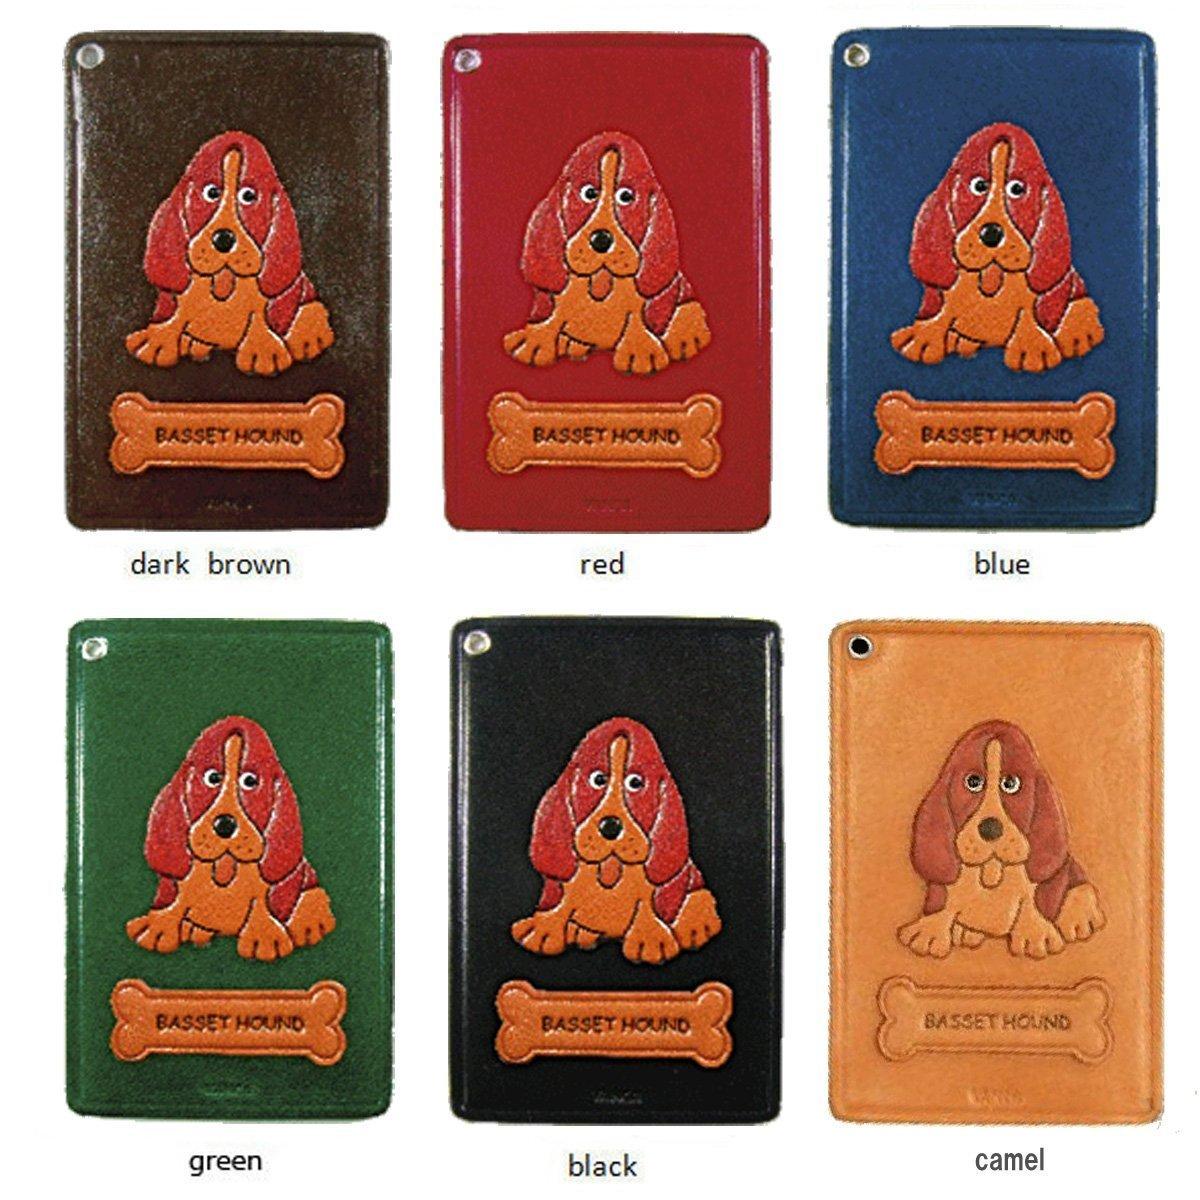 Basset Hound Leather Dog Pass/ID/Credit/Card Holder/CaseVANCA Handmade in Japan